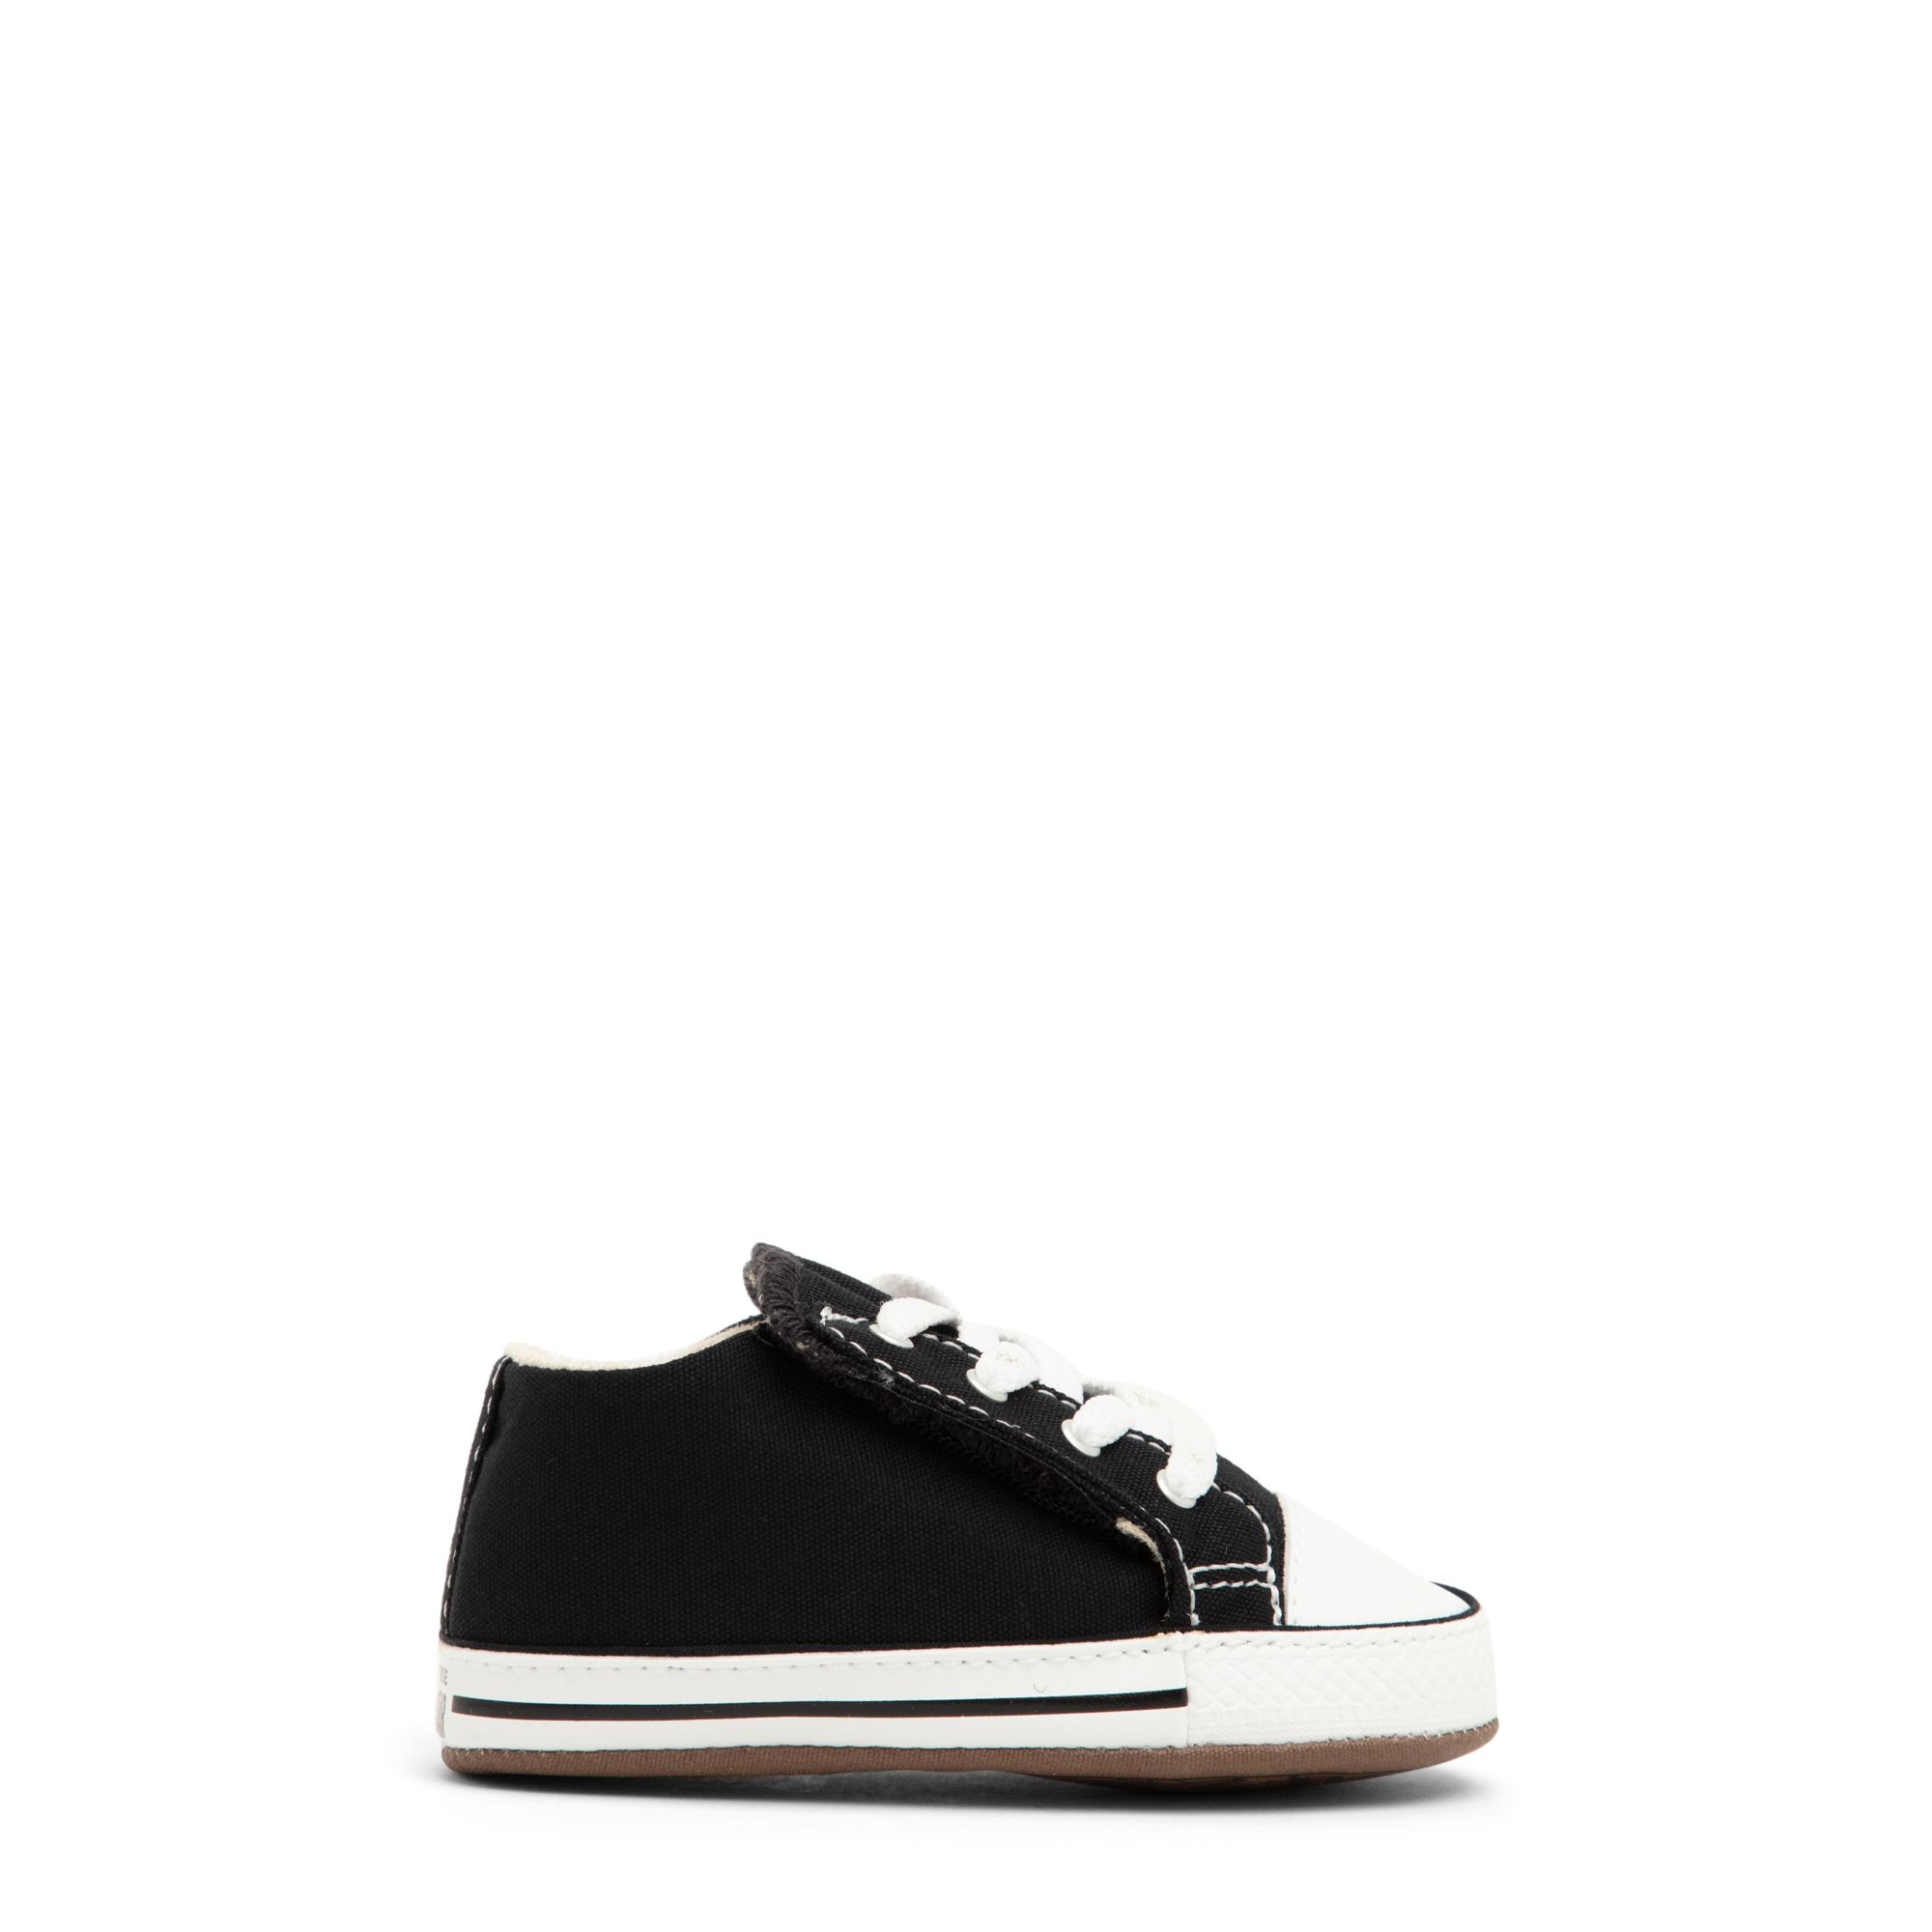 Chuck Taylor All Star crib shoes